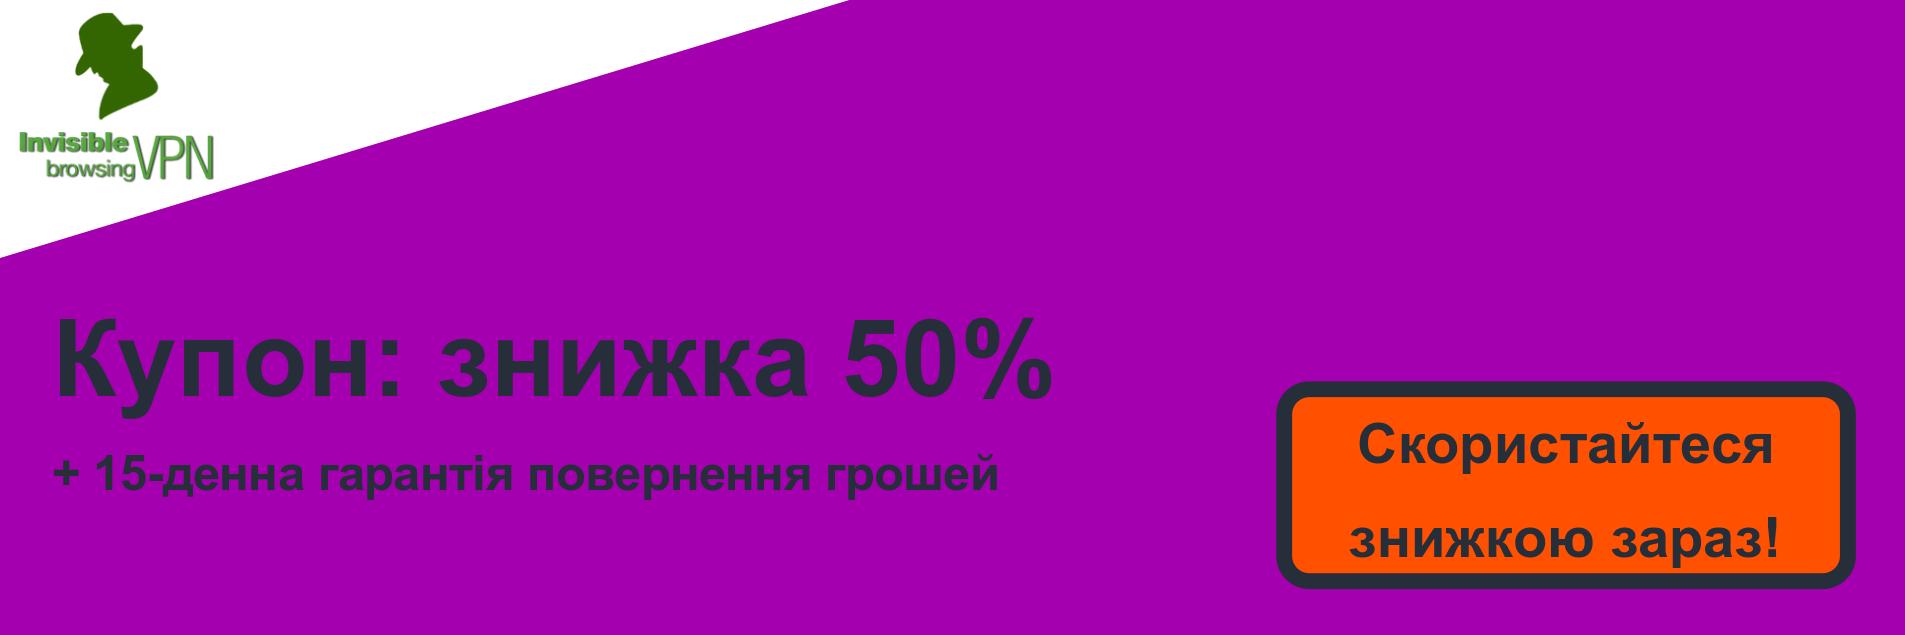 банер купона ibVPN - знижка 50%